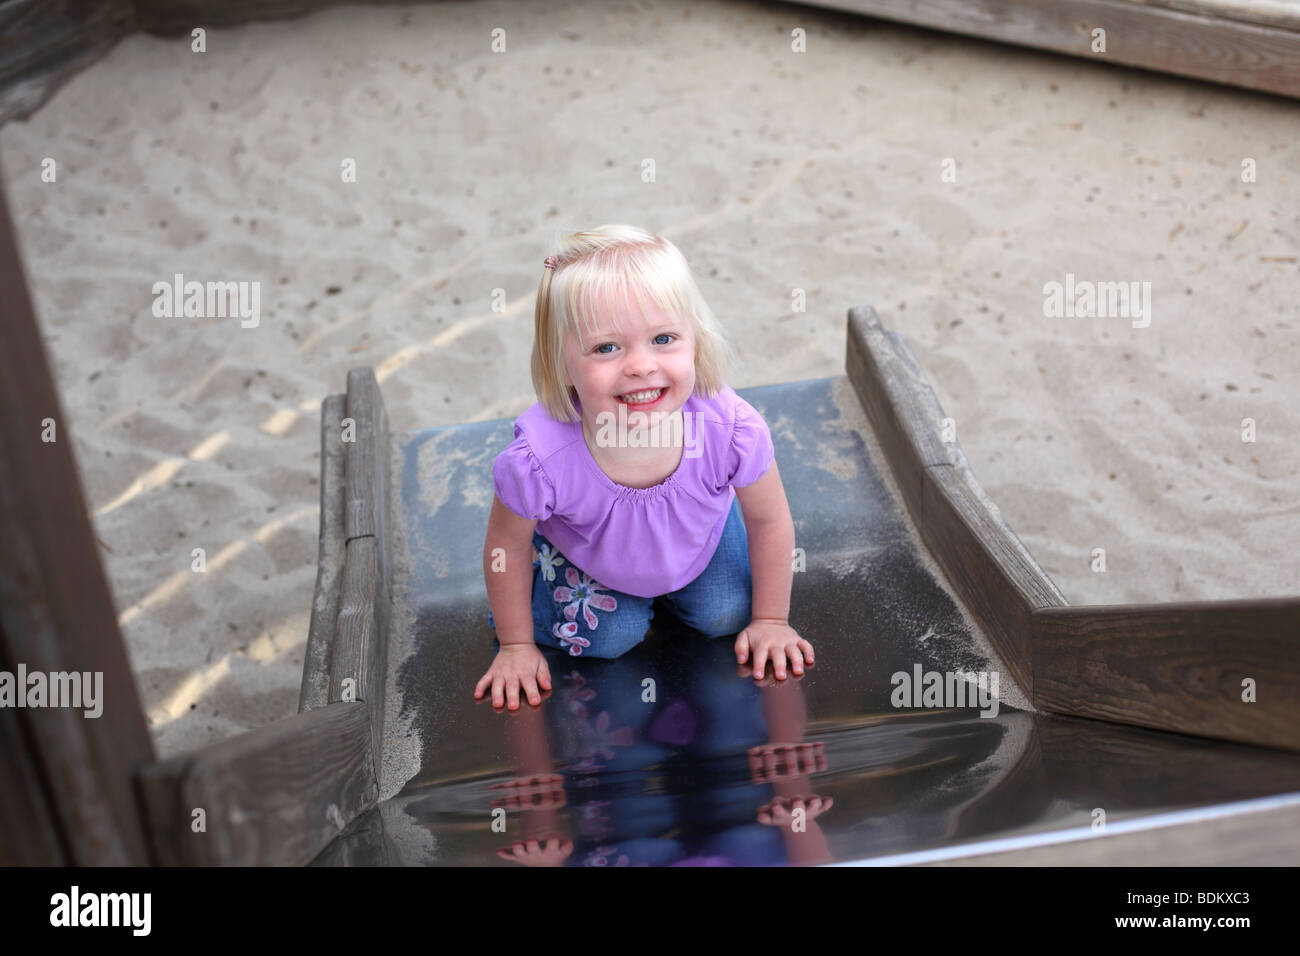 Joven sonriente en la diapositiva Imagen De Stock